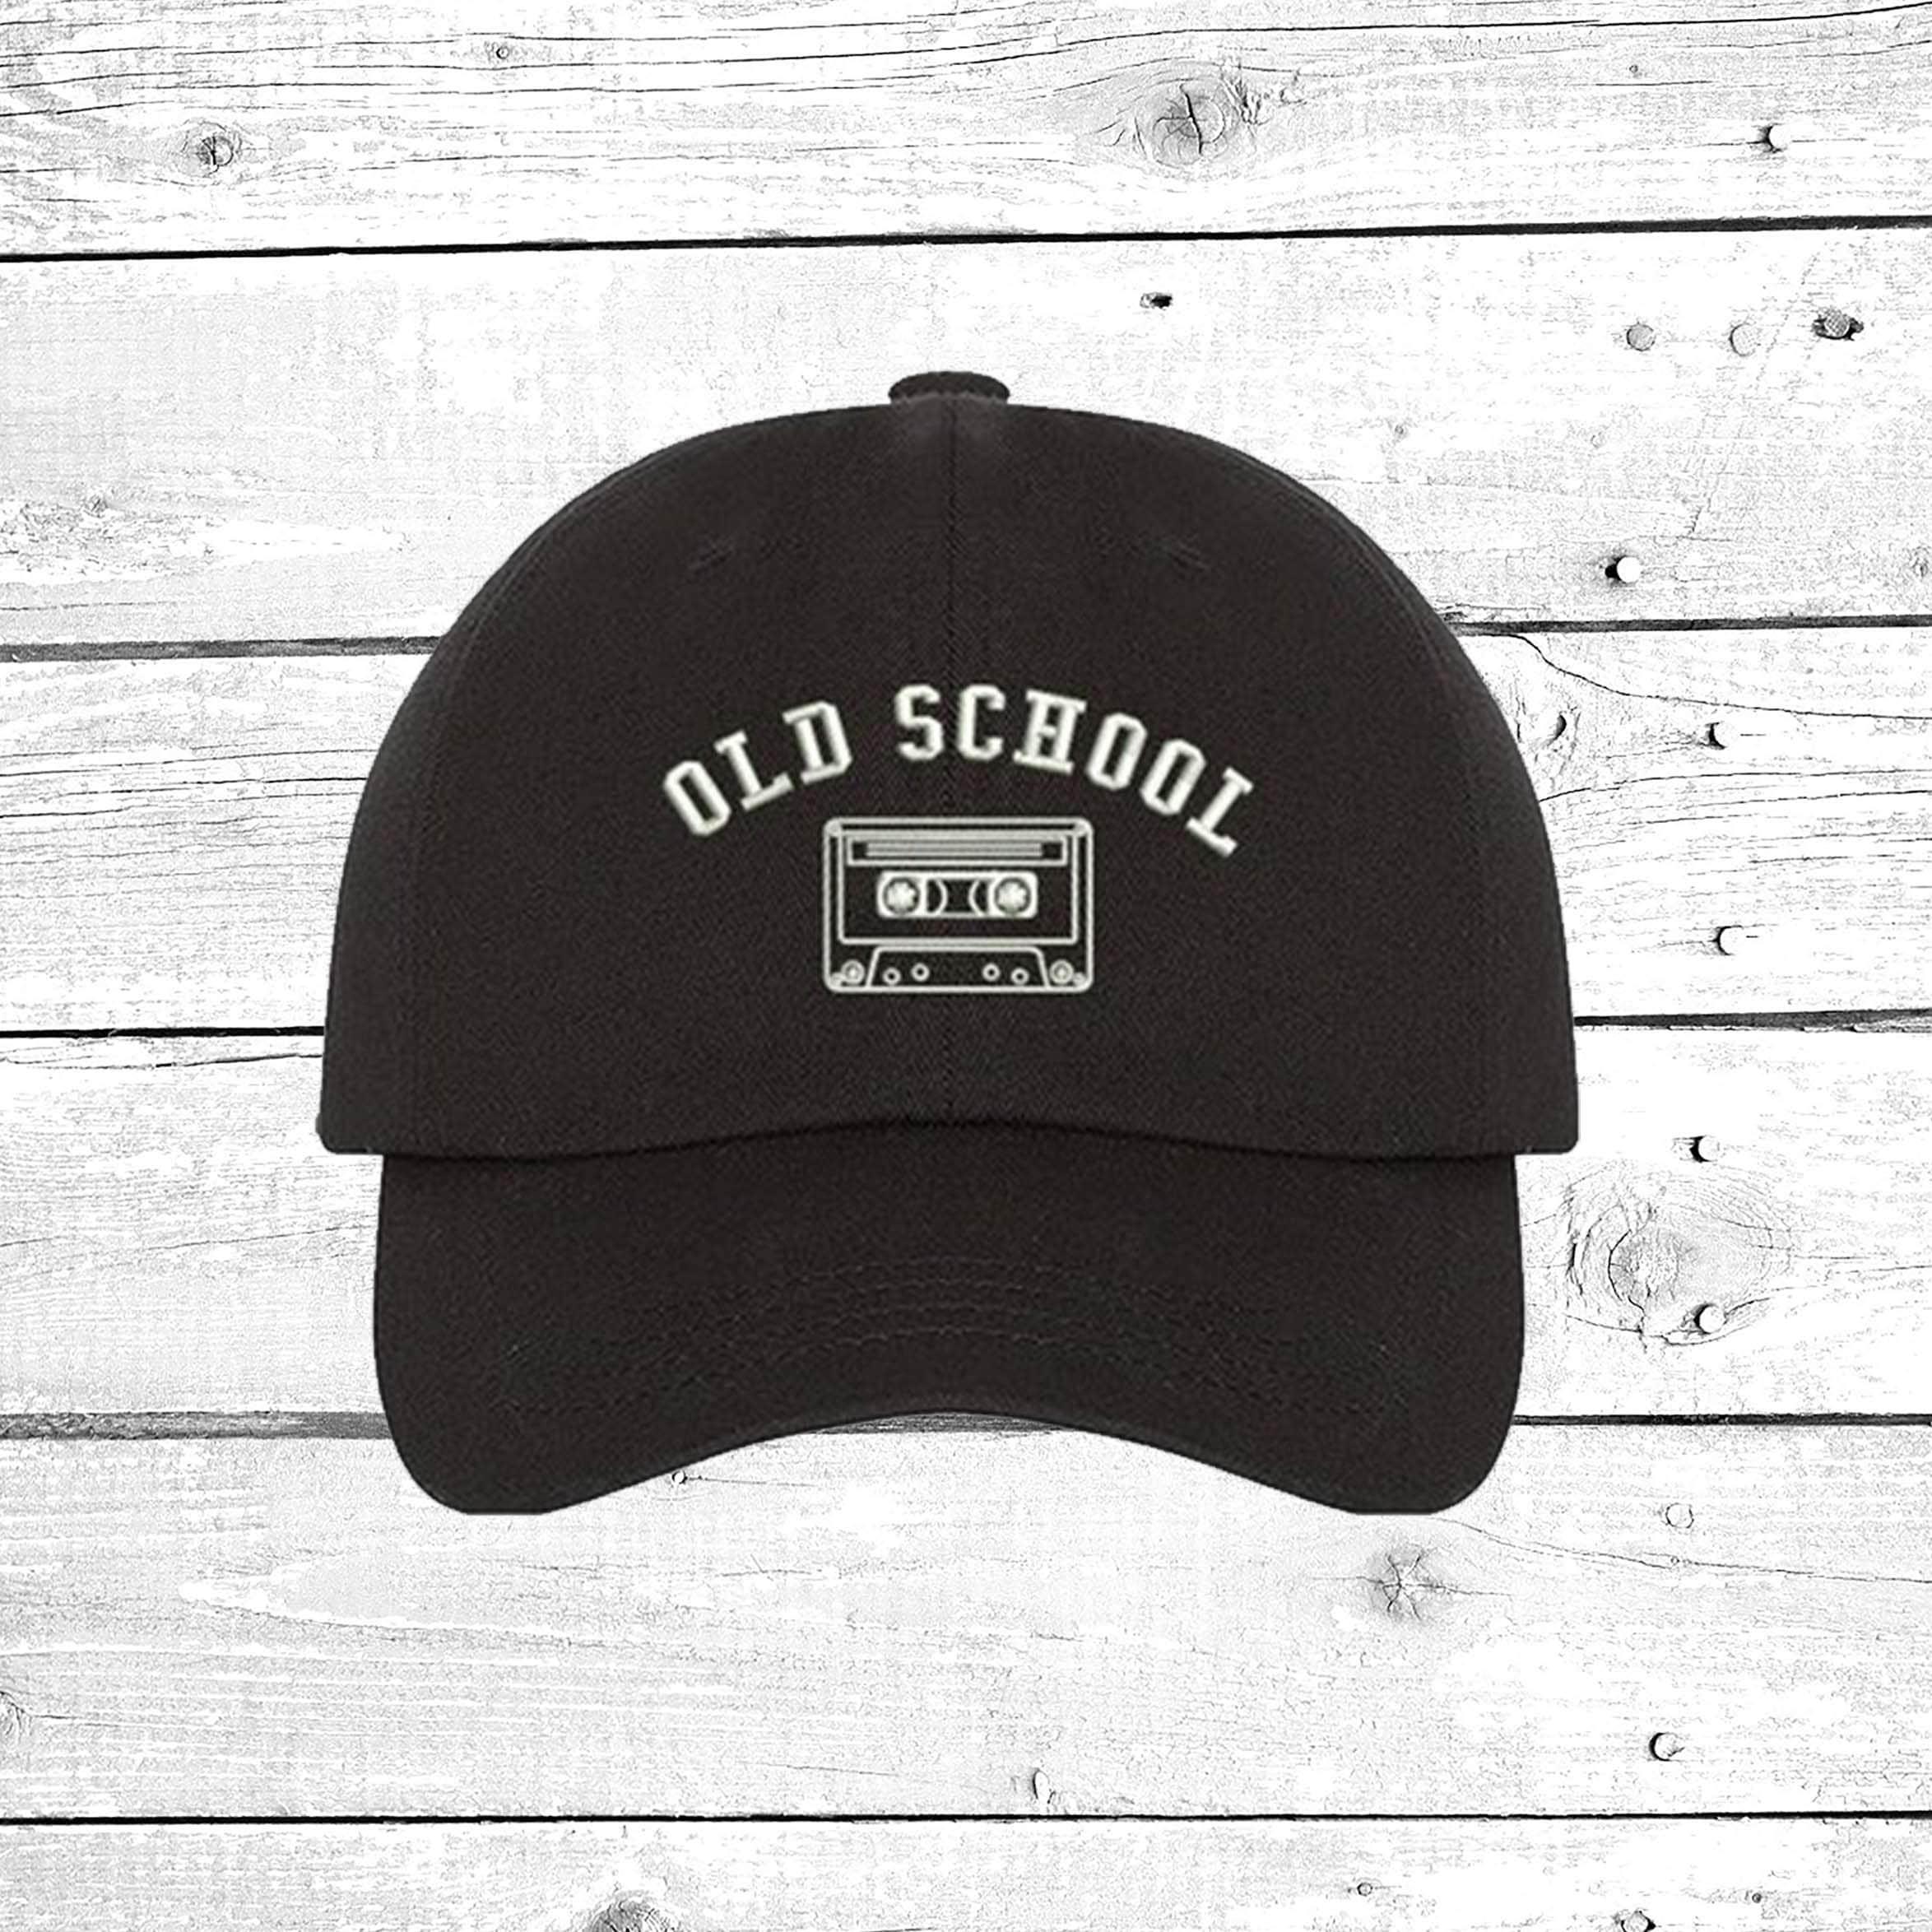 20795331 Hats Vintage 90 S Inspired Old School Cassette Baseball Hat Retro